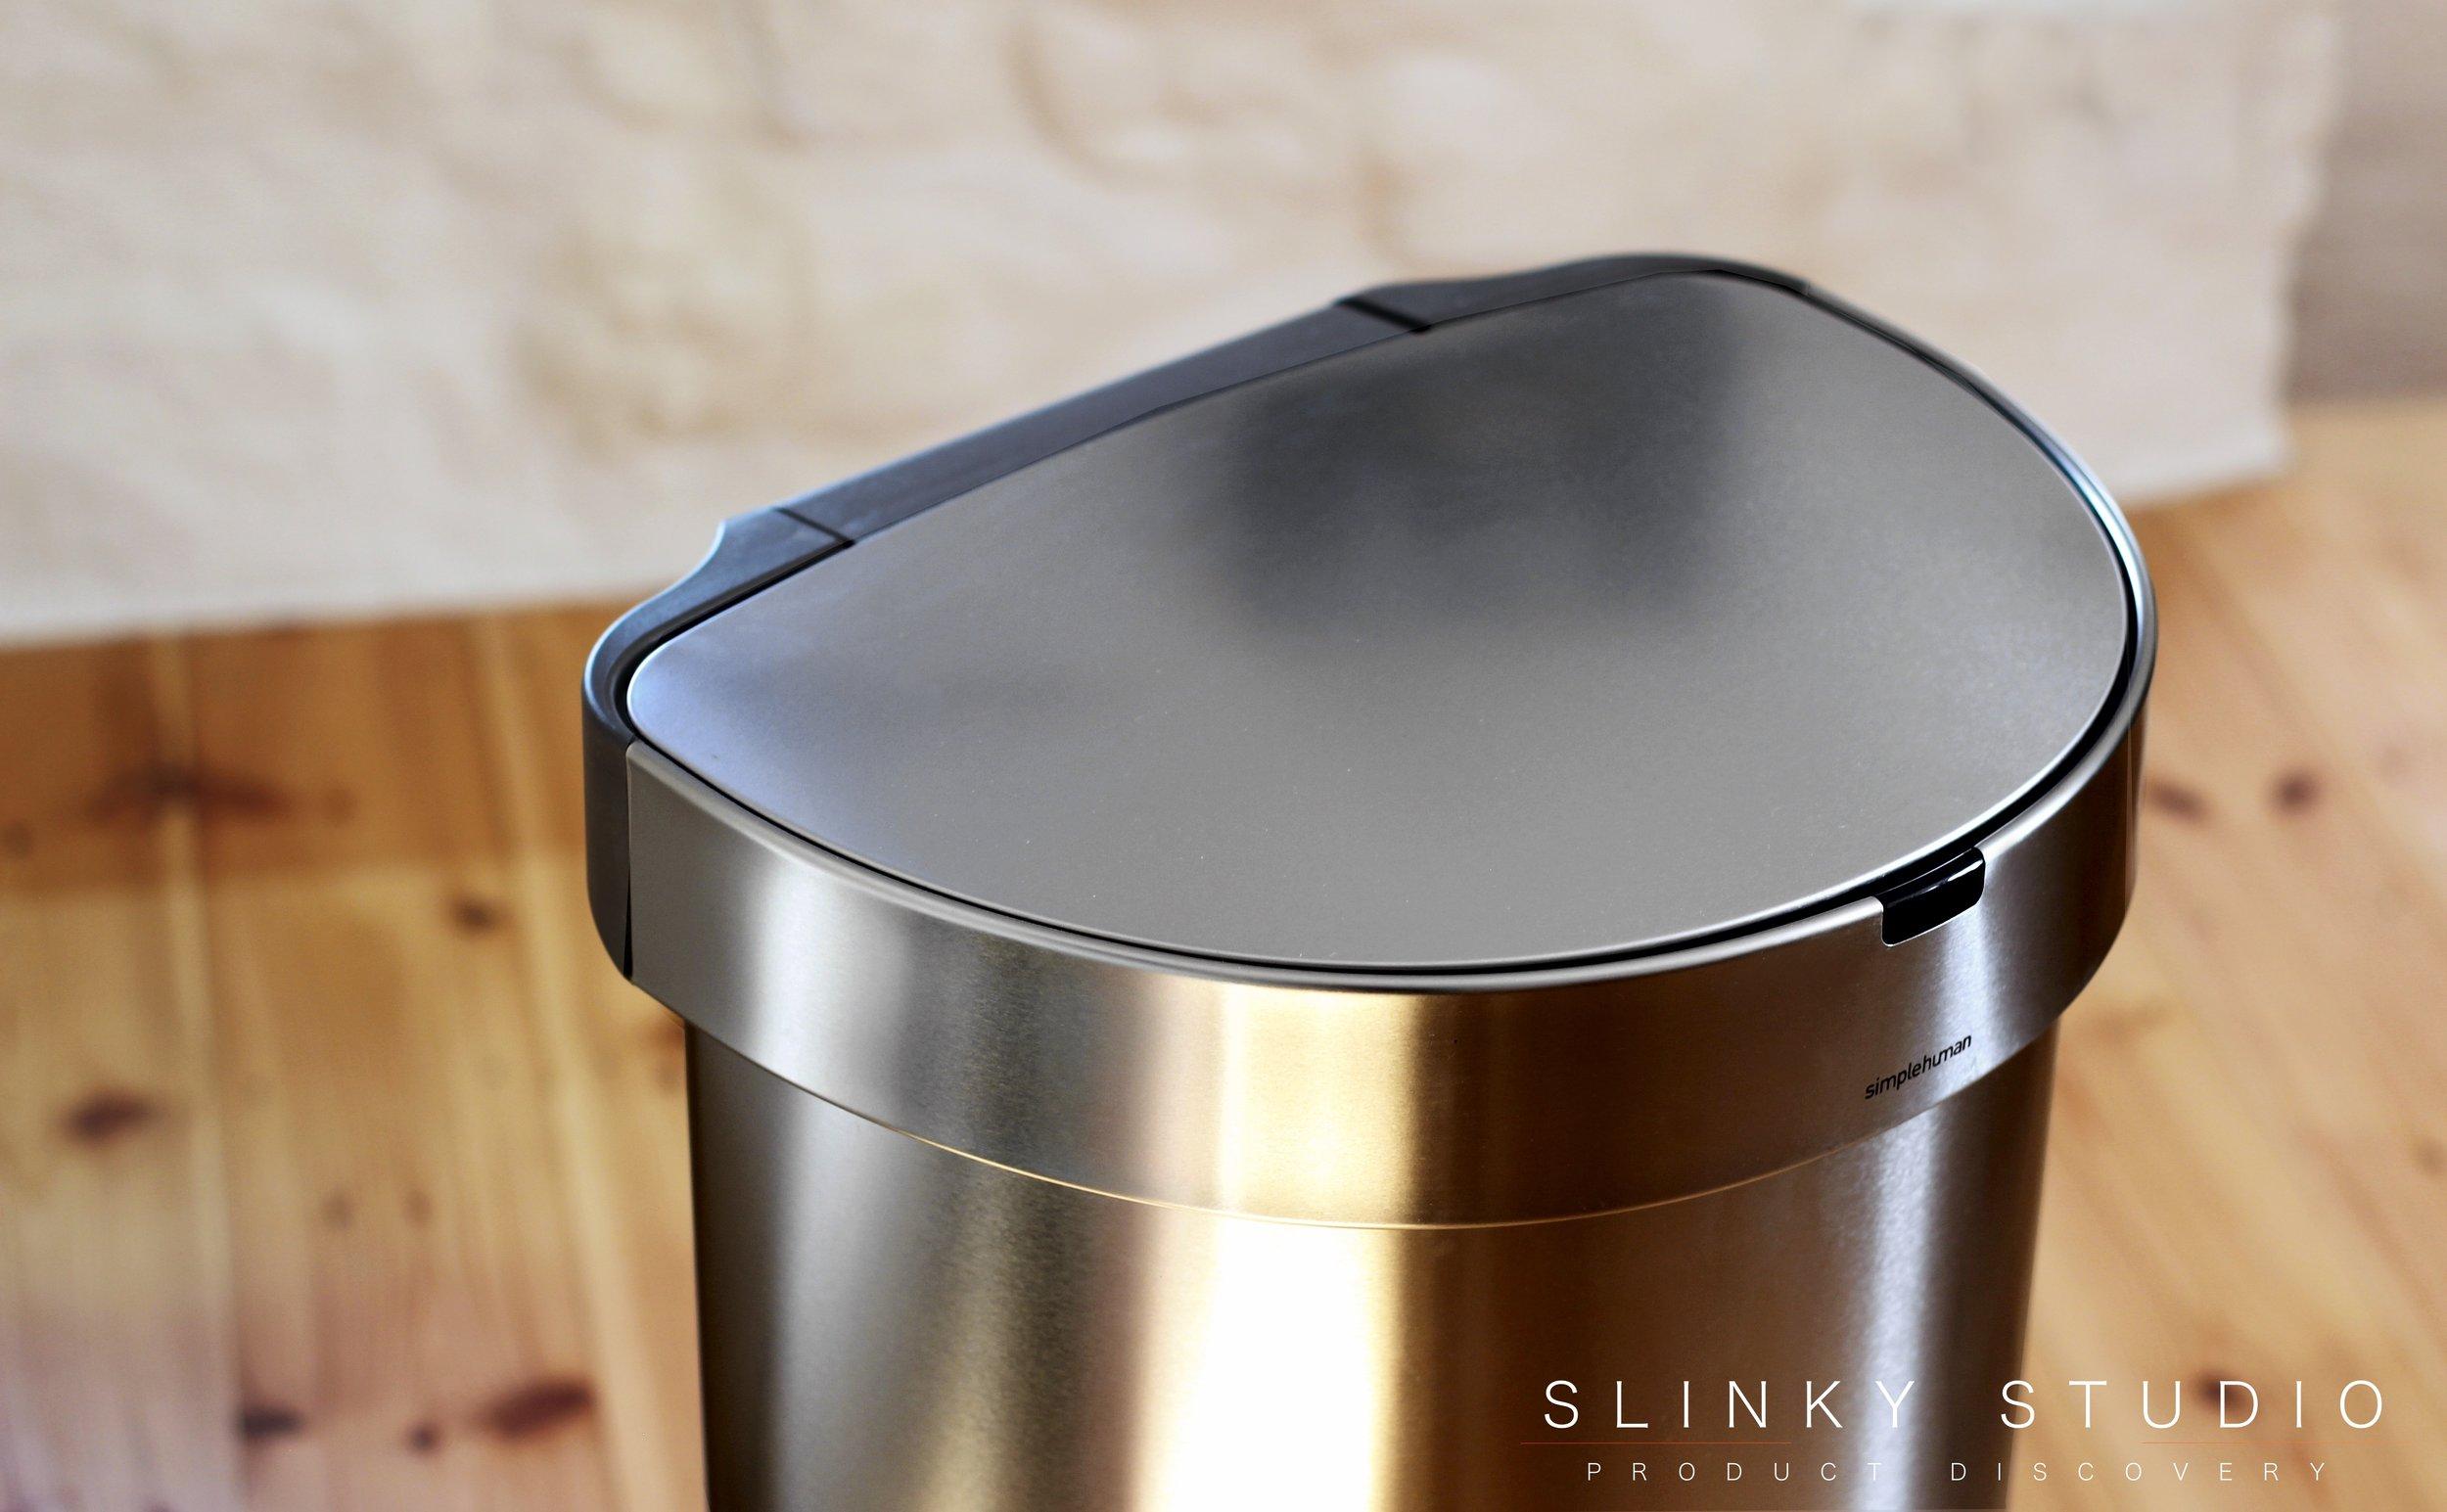 simplehuman 45 litre Semi-Round Sensor Bin Above View.jpg